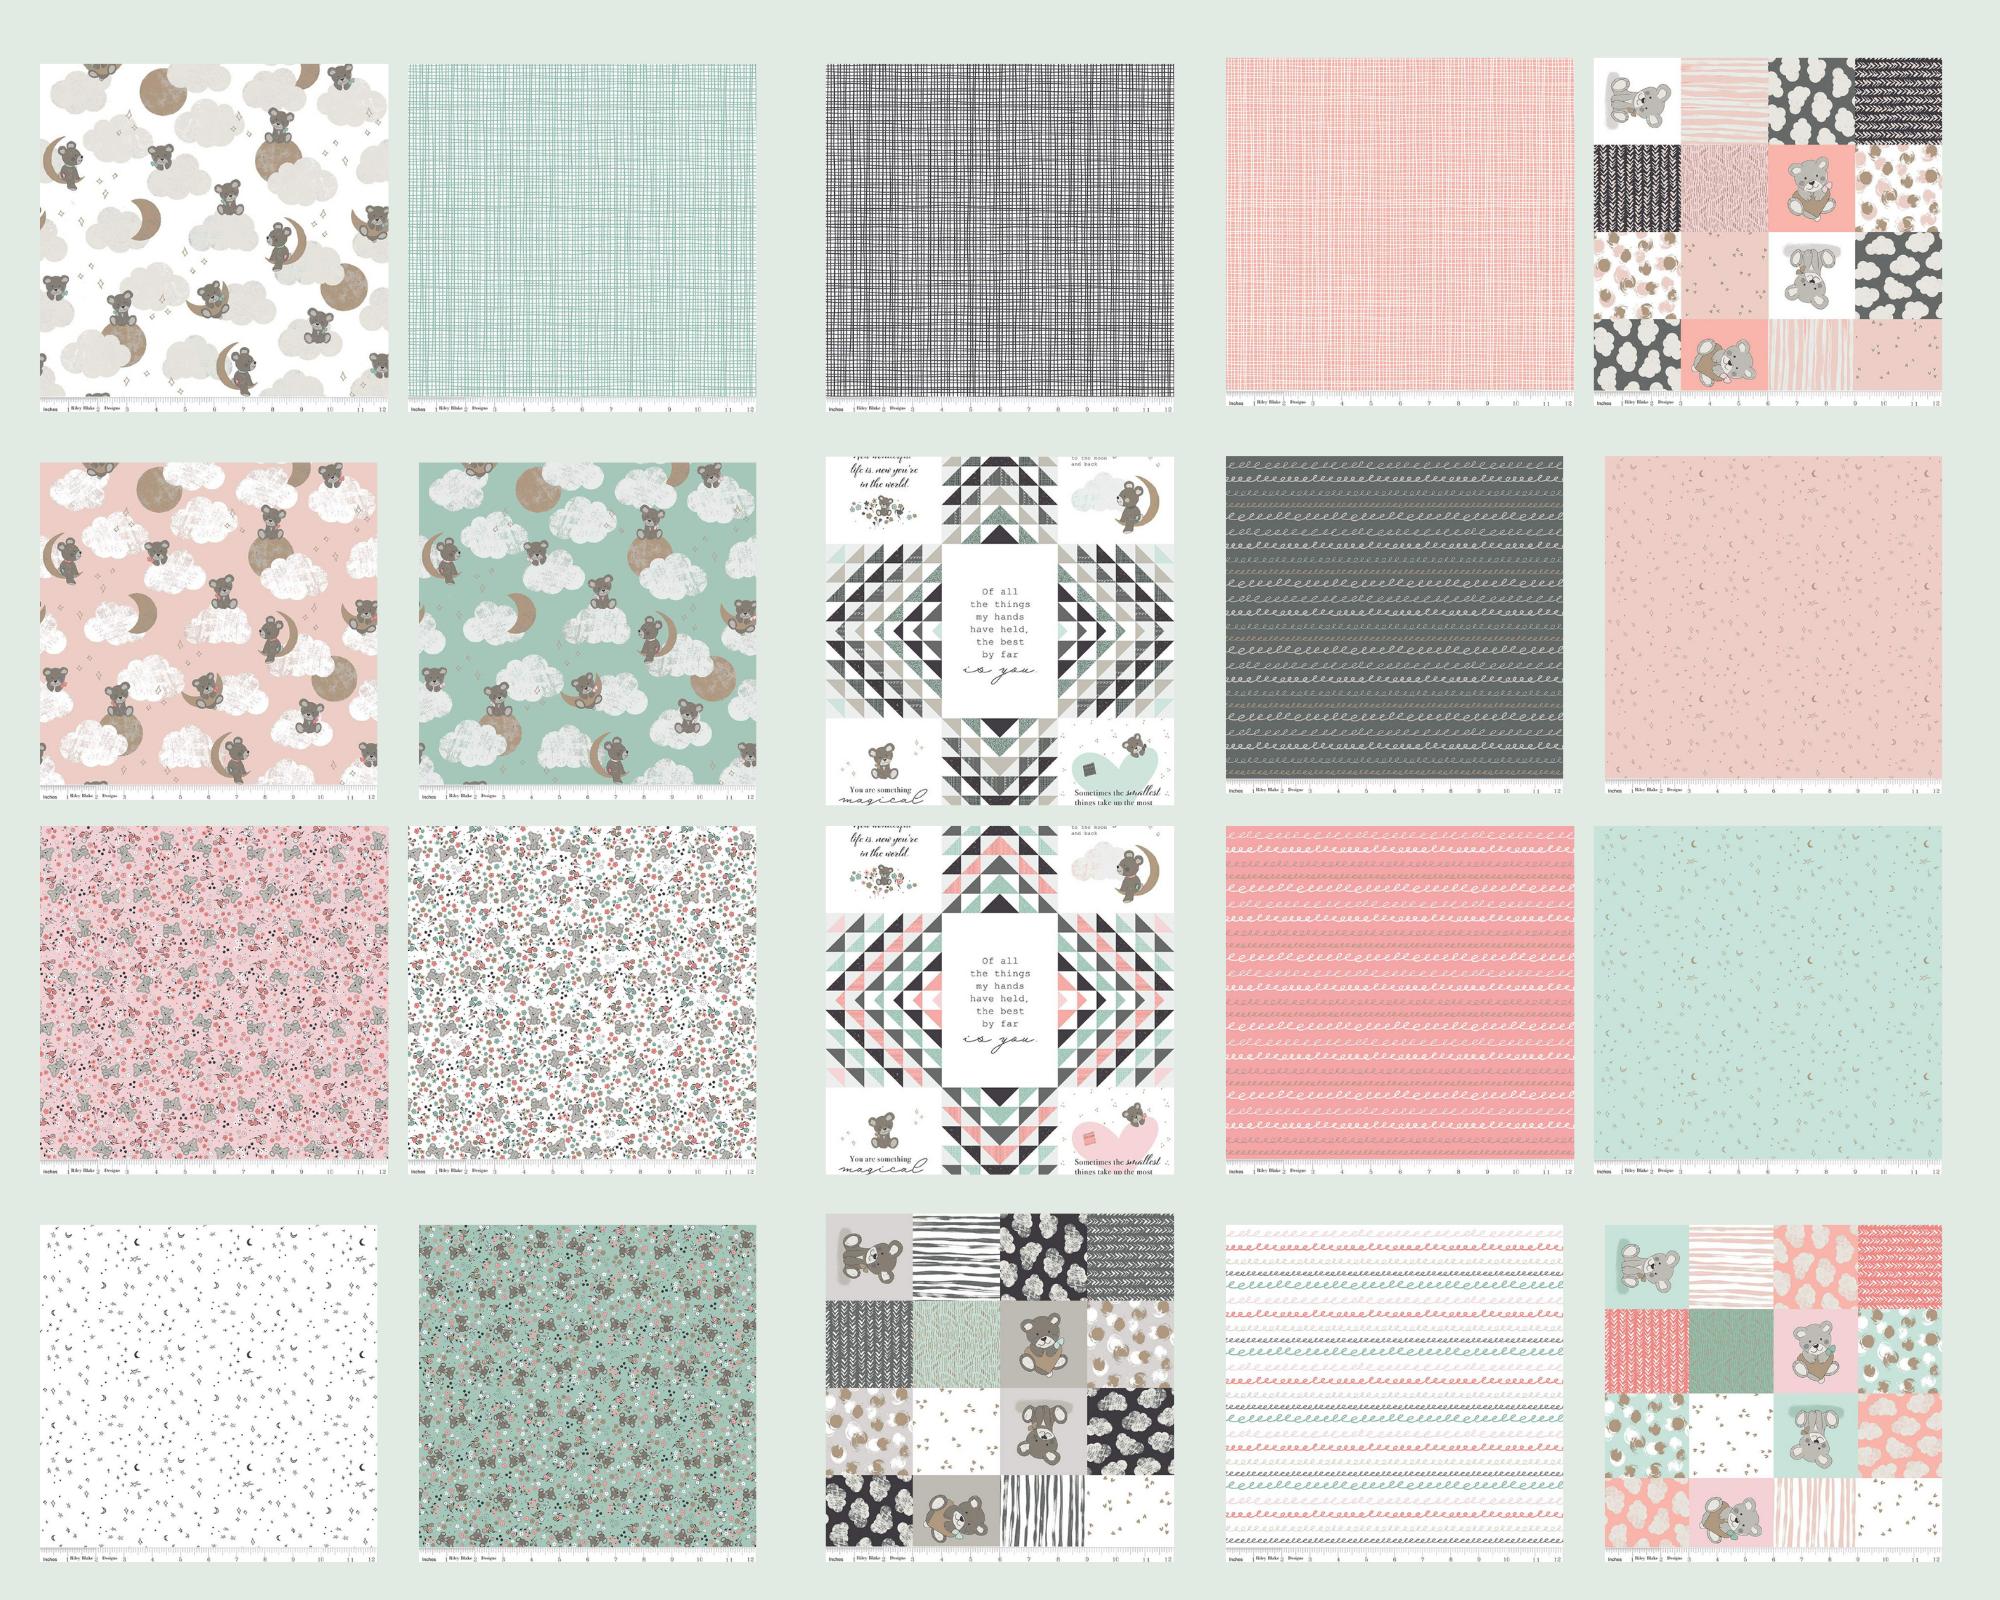 Sleep Tight - Fat Quarter Bundle 20pc/bundle*Metallic* - By Gabrielle Neil Design Studio For Riley Blake